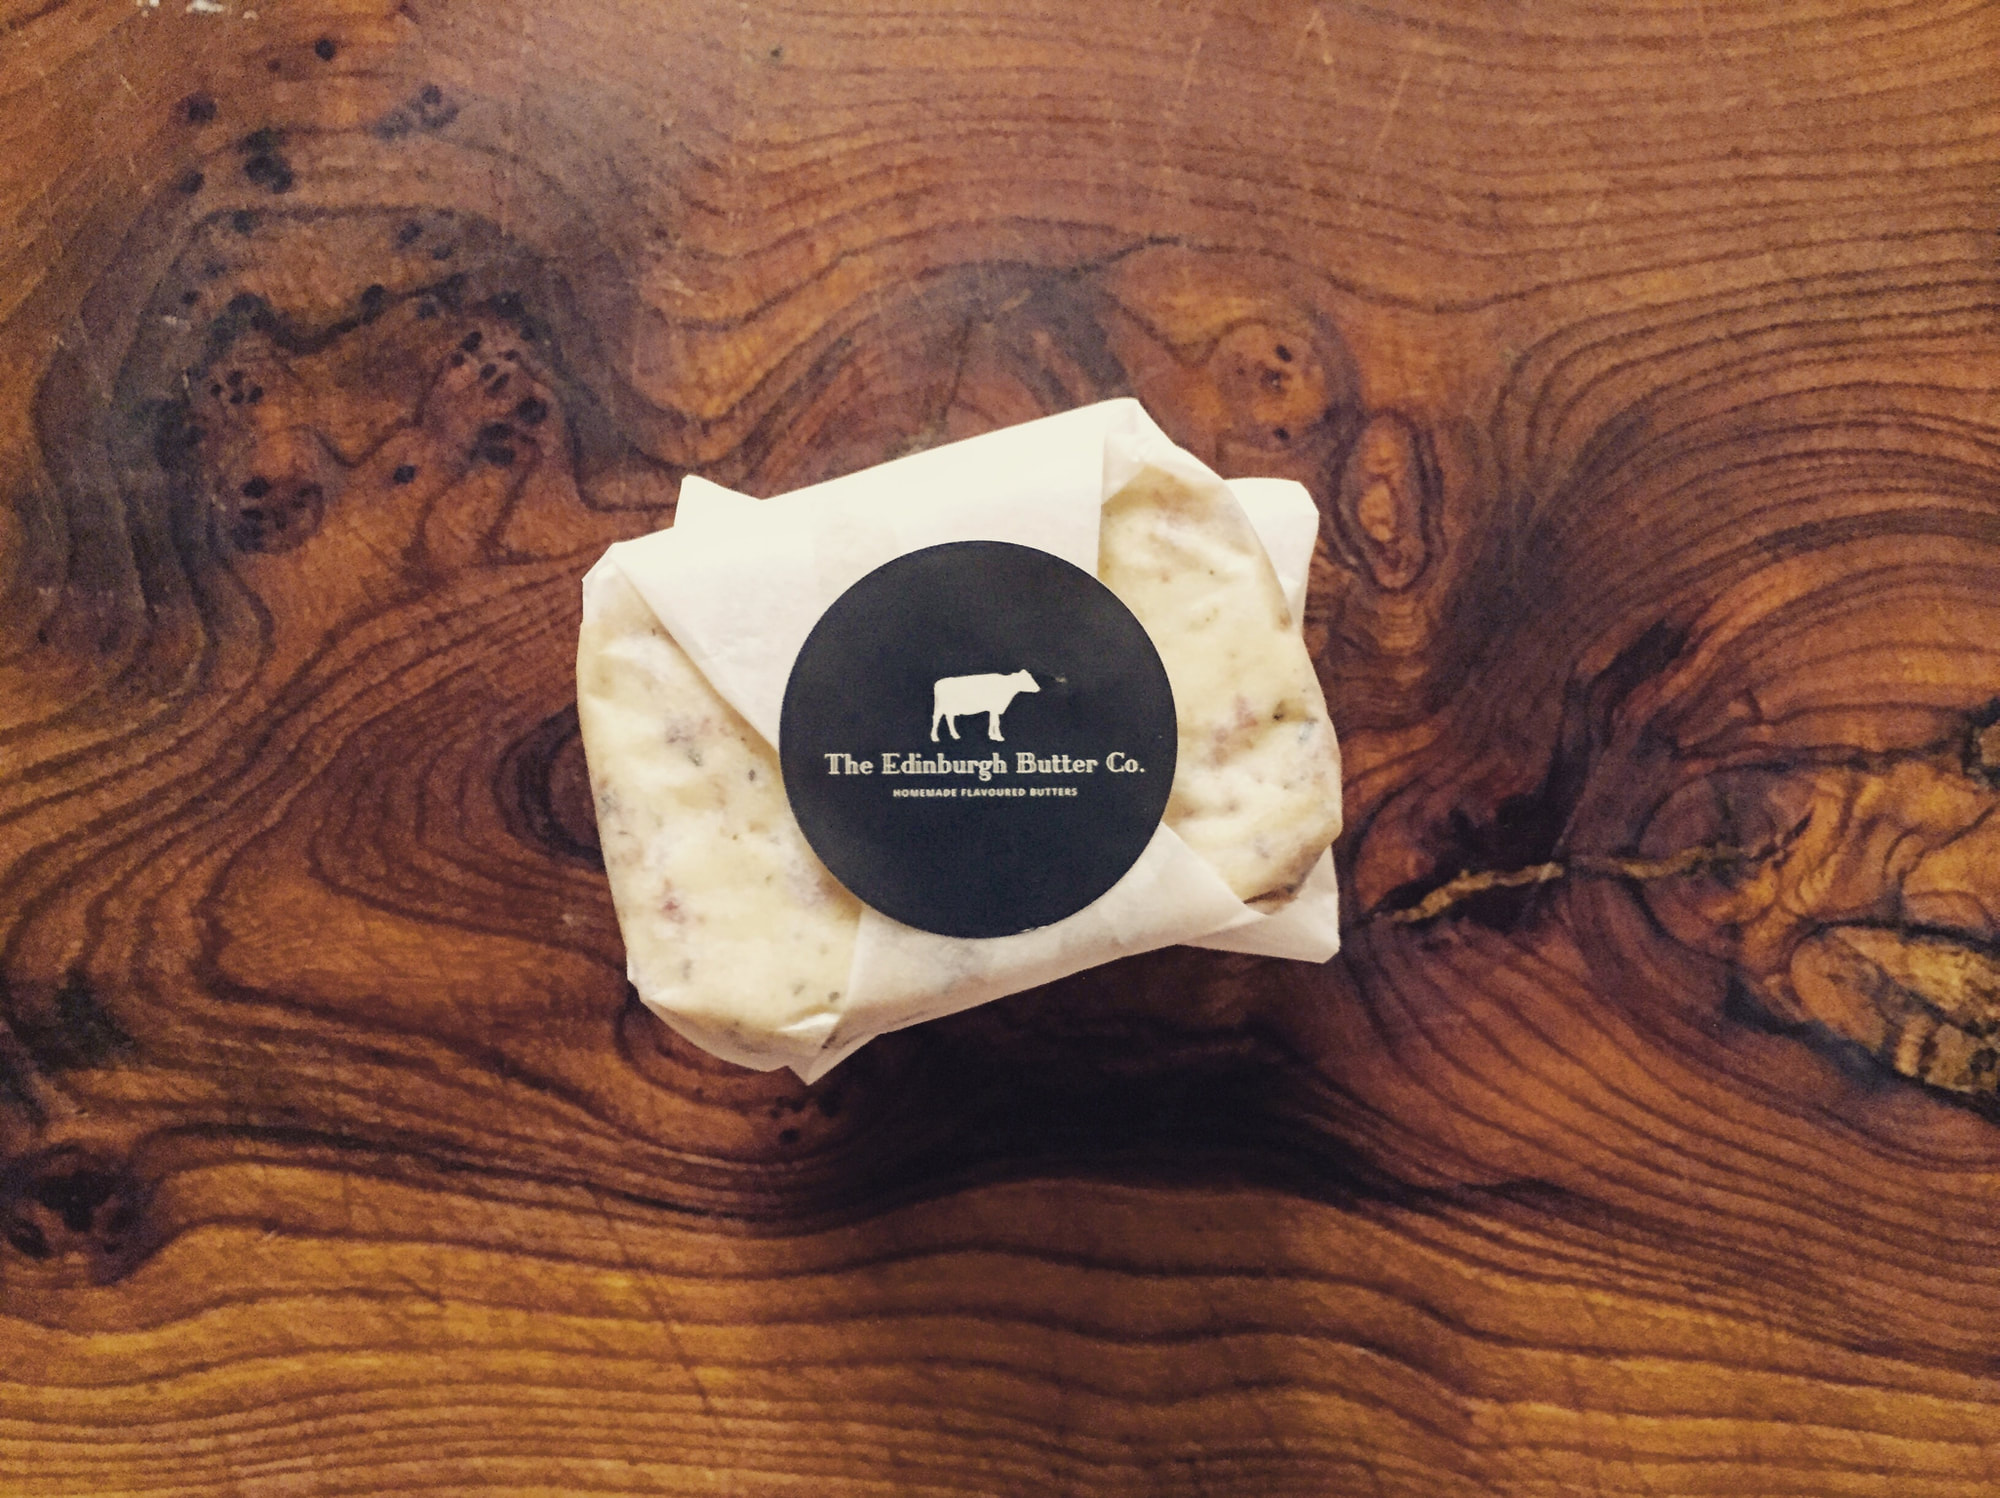 Edinburgh Butter Co